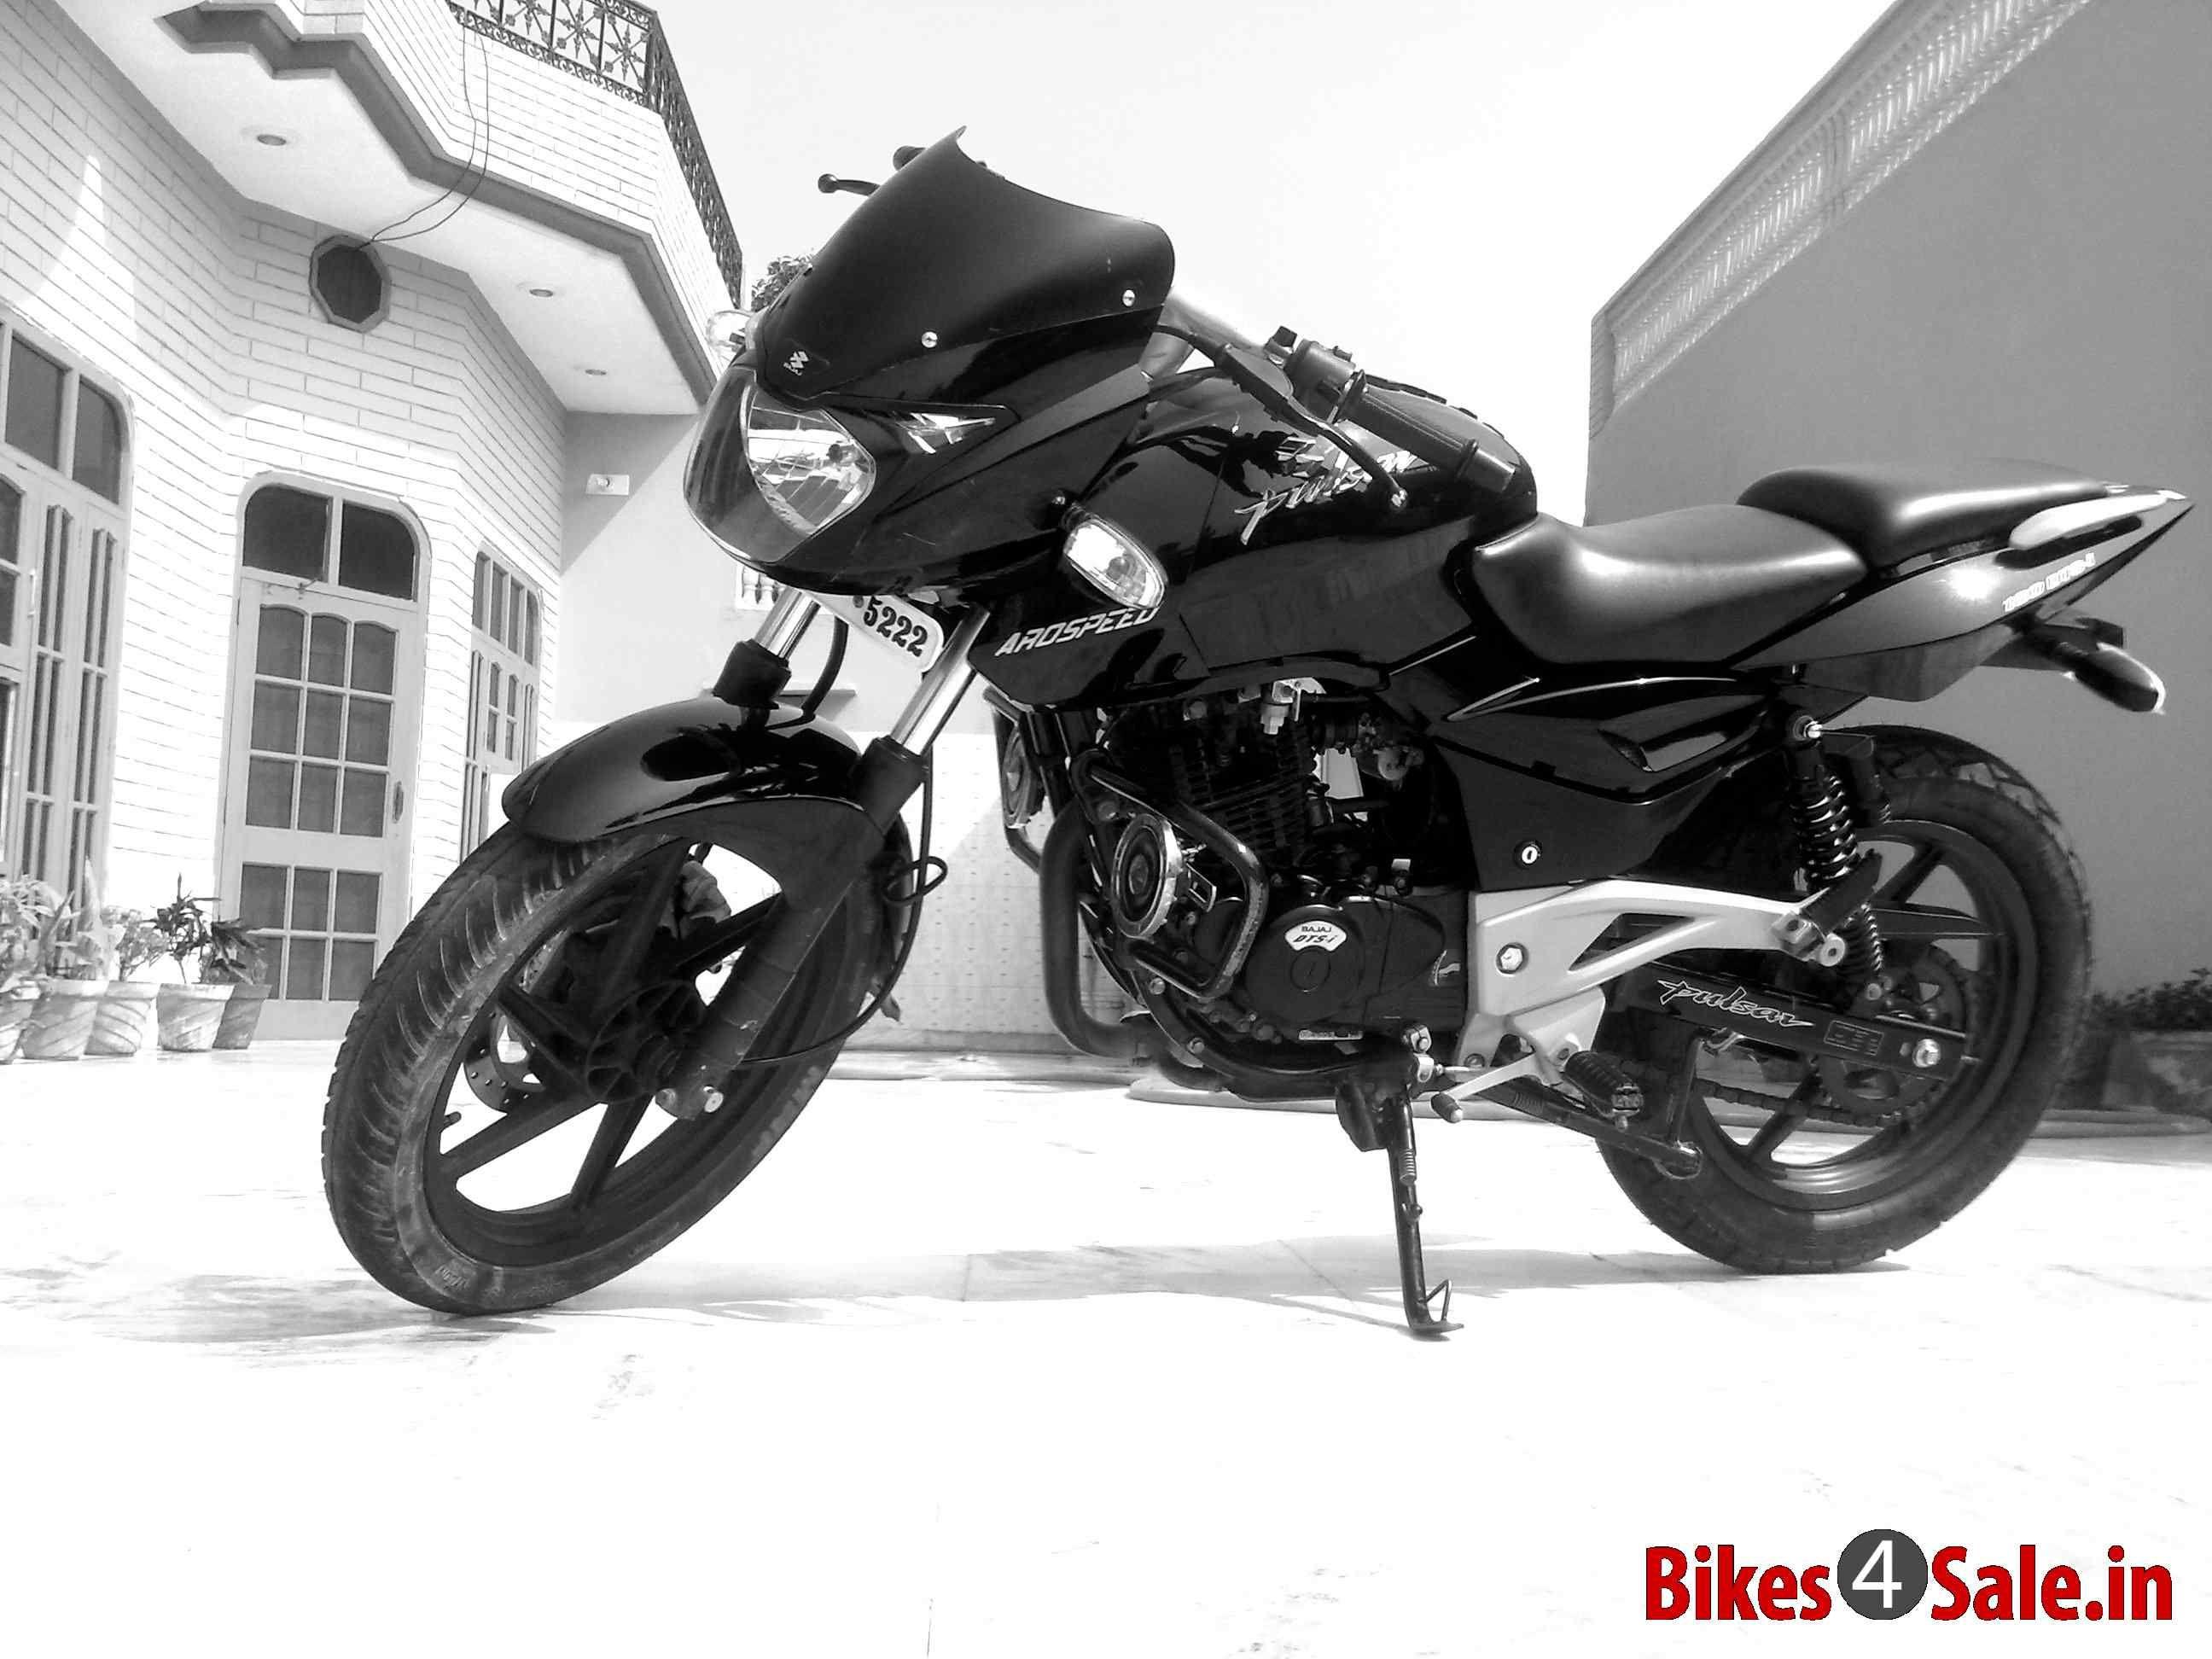 Pulsar Definitely Male Pulsar Bike Motorcycle Garage